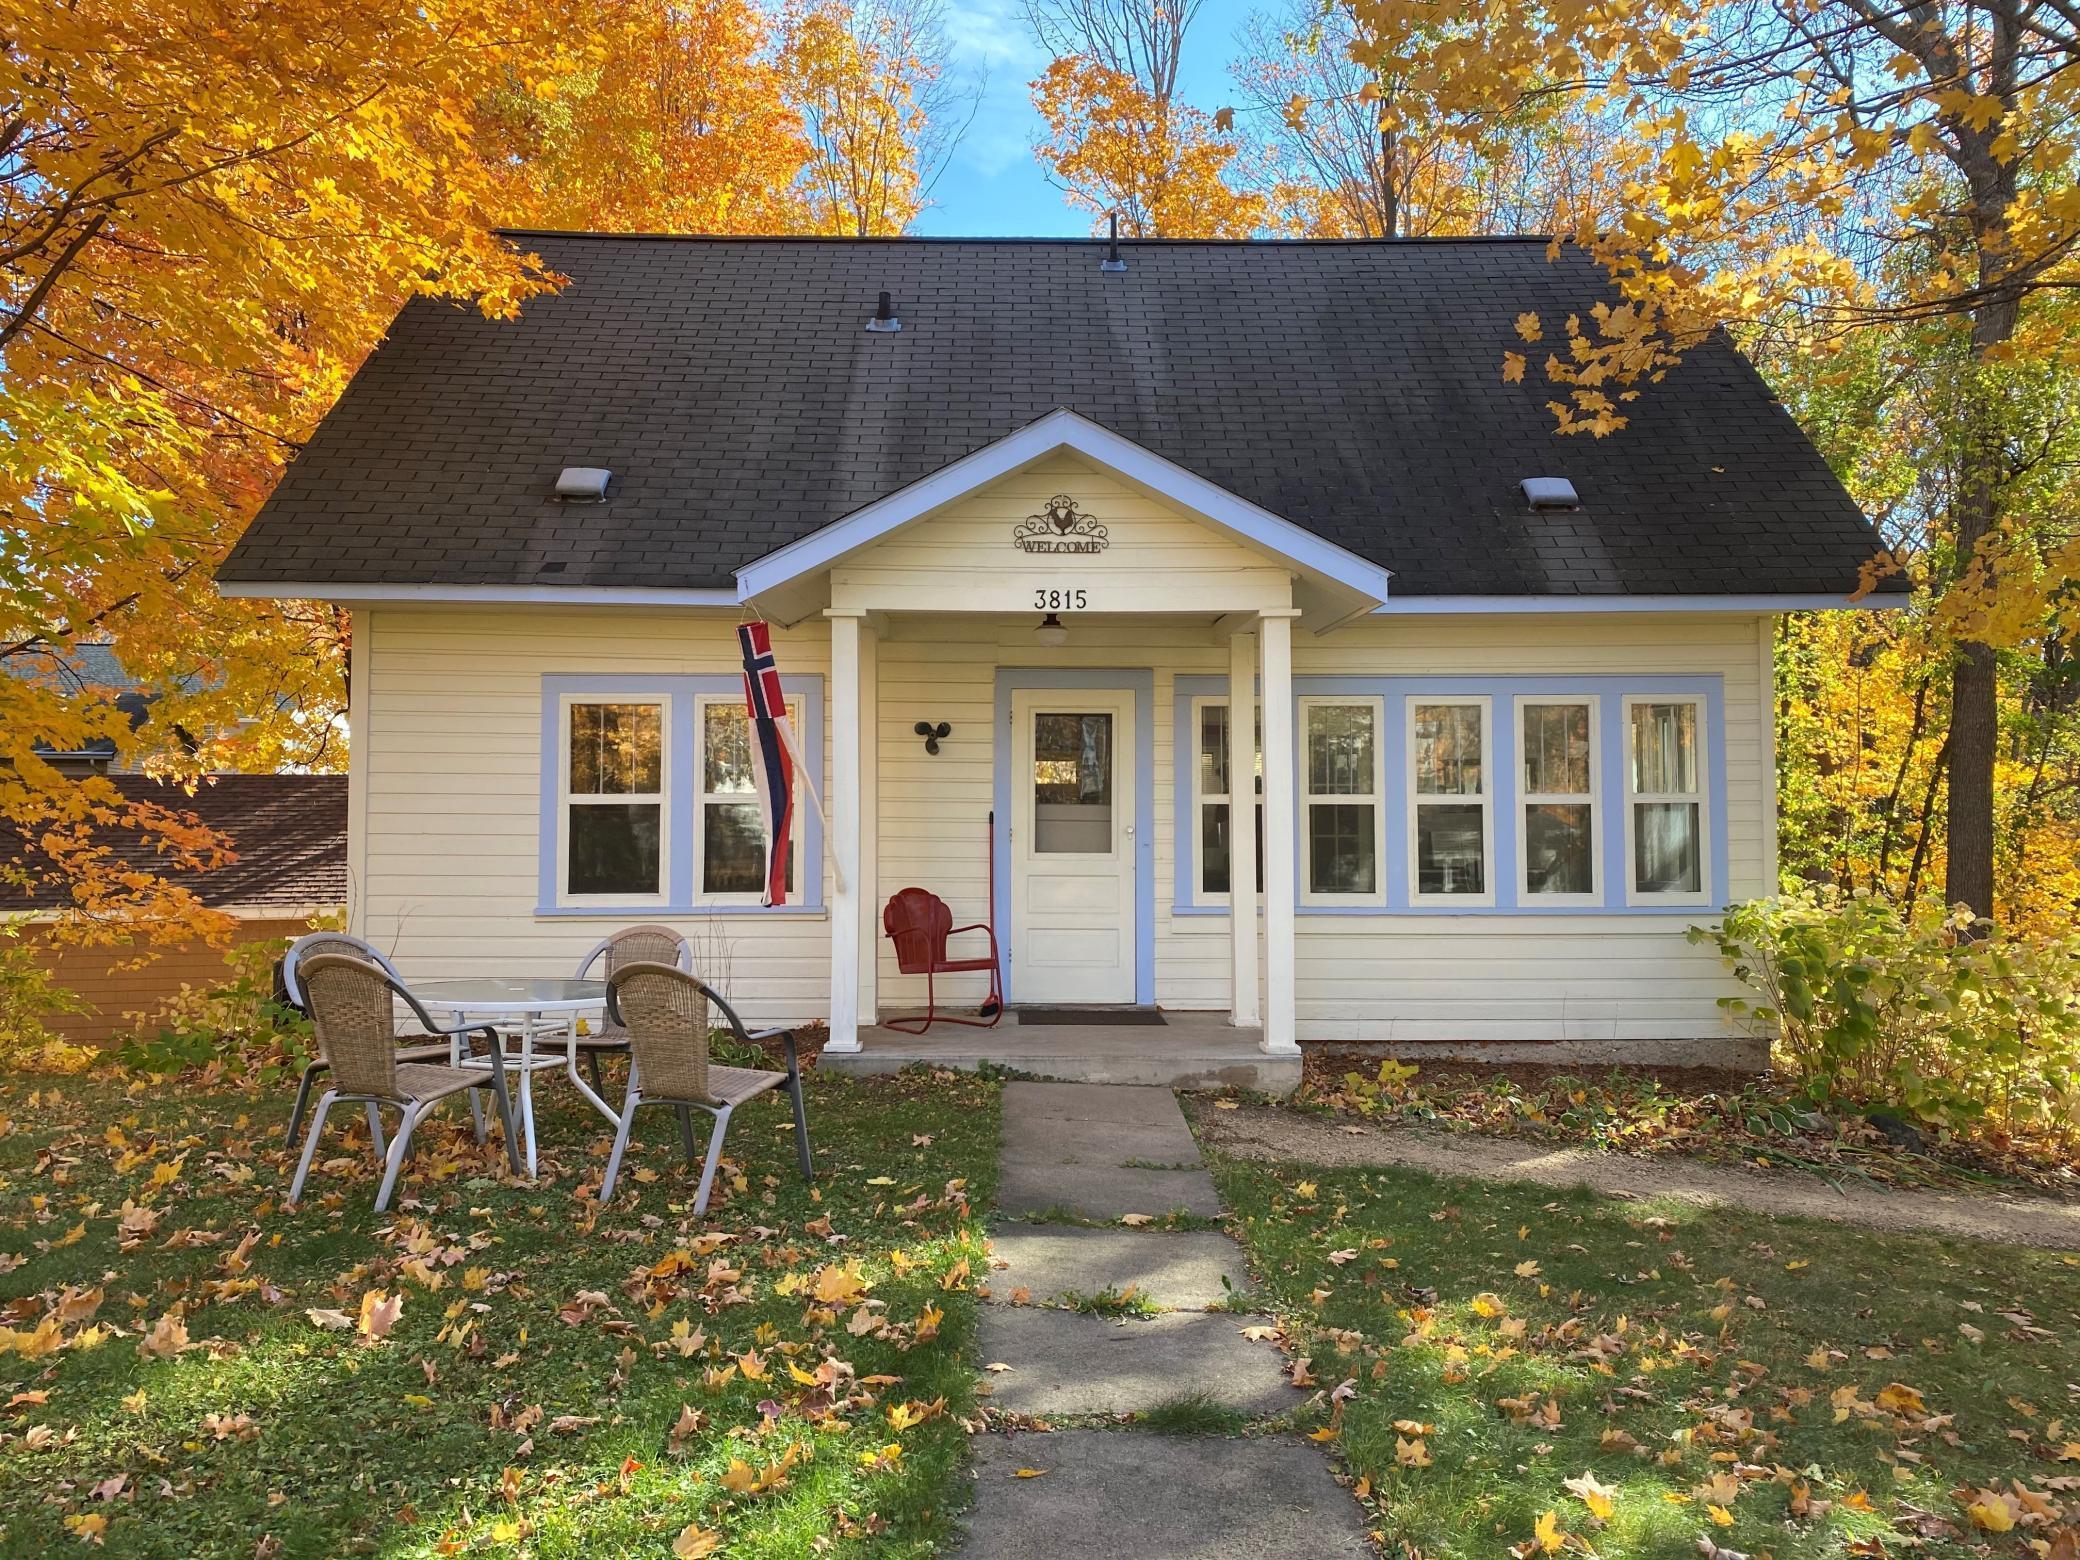 3815 Deephaven Avenue Property Photo - Deephaven, MN real estate listing